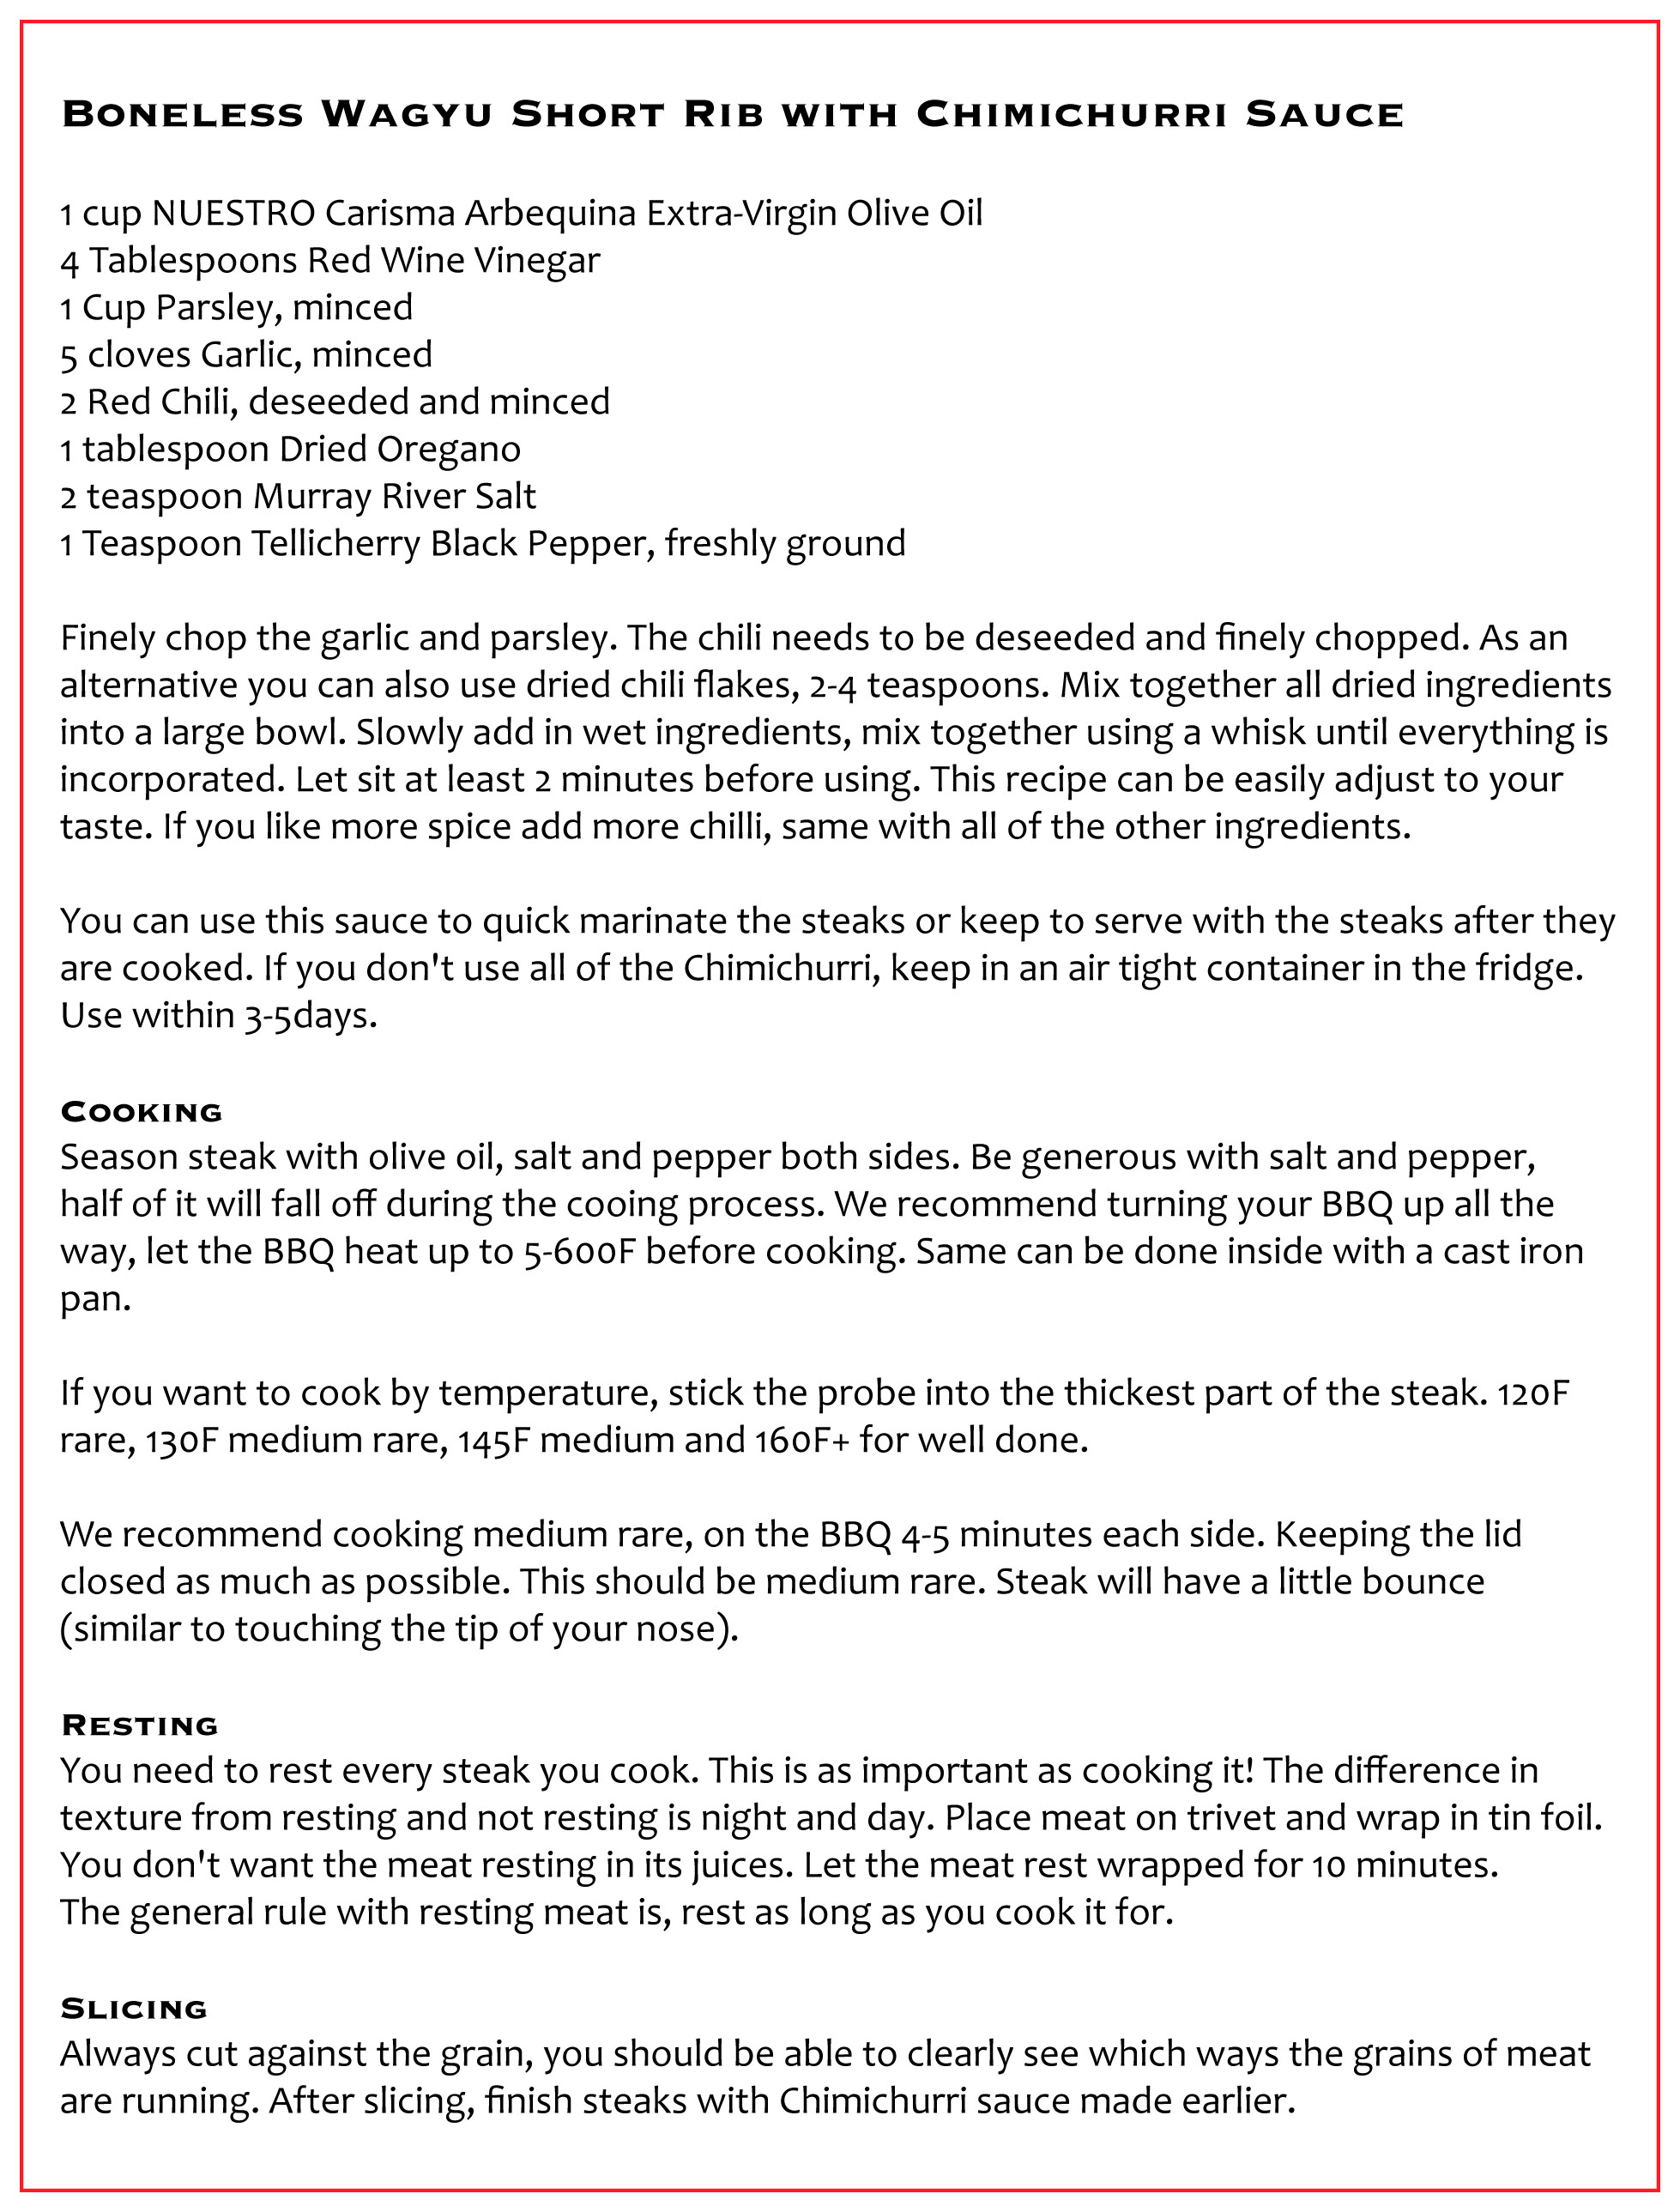 NEW RECIPE: Boneless Wagyu Short Rib w/ Chimichurri Sauce